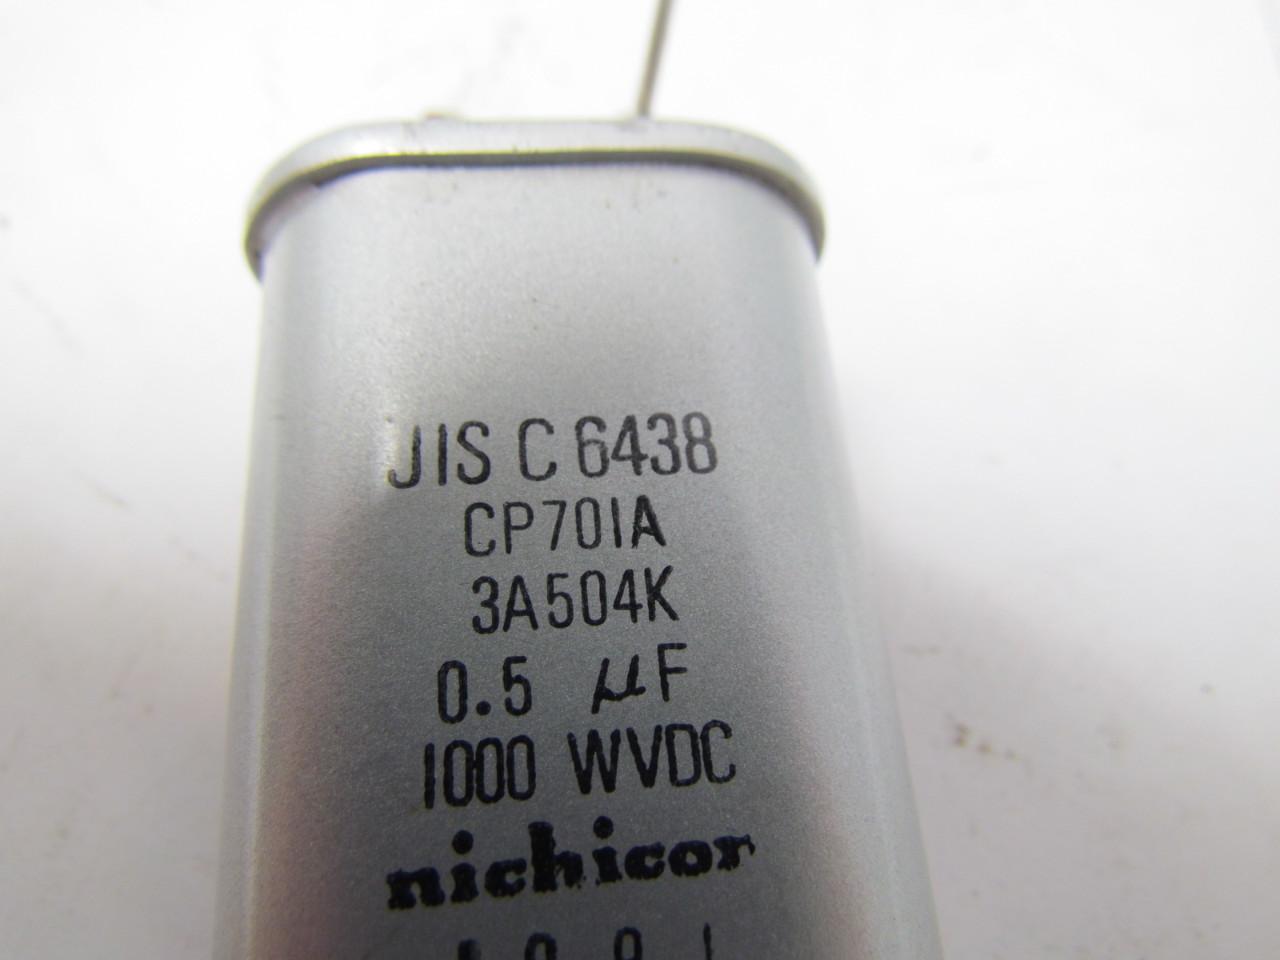 nichicon jis c 6438 dry electrolytic capacitor 0 5 uf